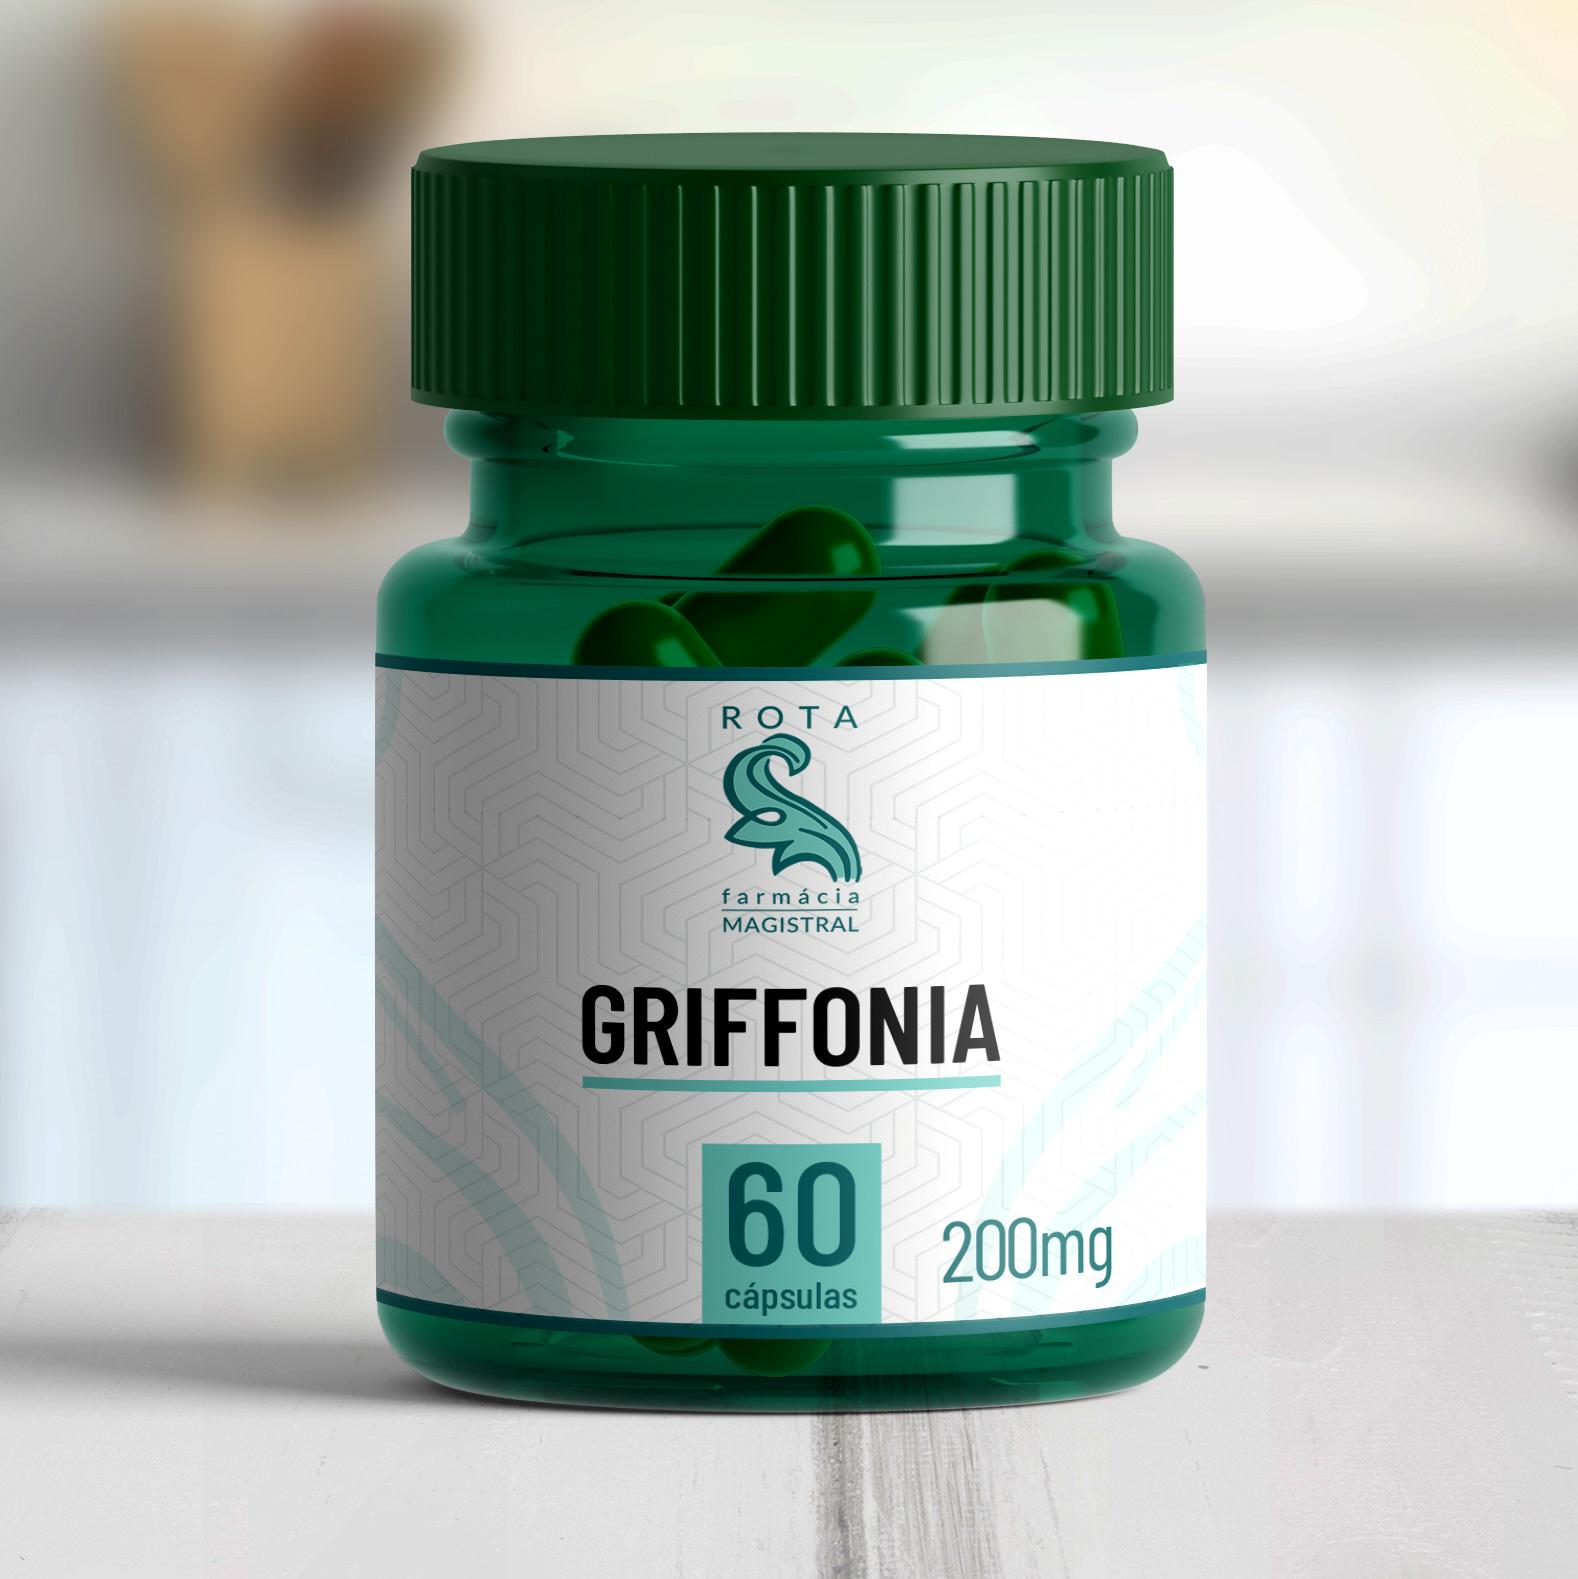 Griffonia 200mg 60 cápsulas